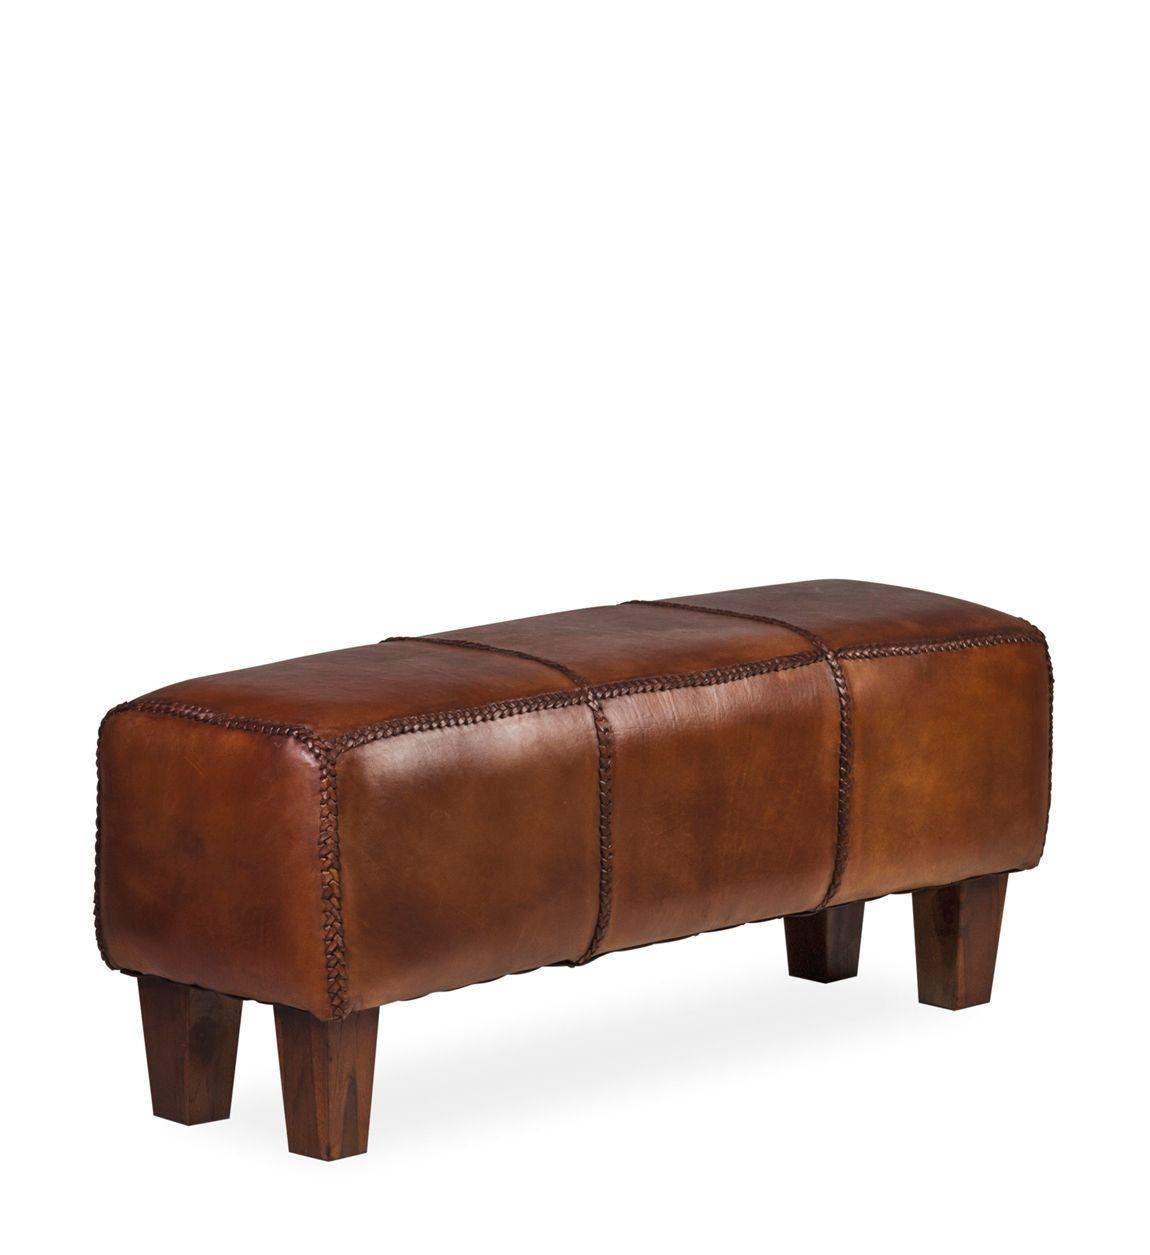 Banca tapitata cu piele naturala si picioare din lemn, Braid Maro Inchis, l110xA35xH45 cm